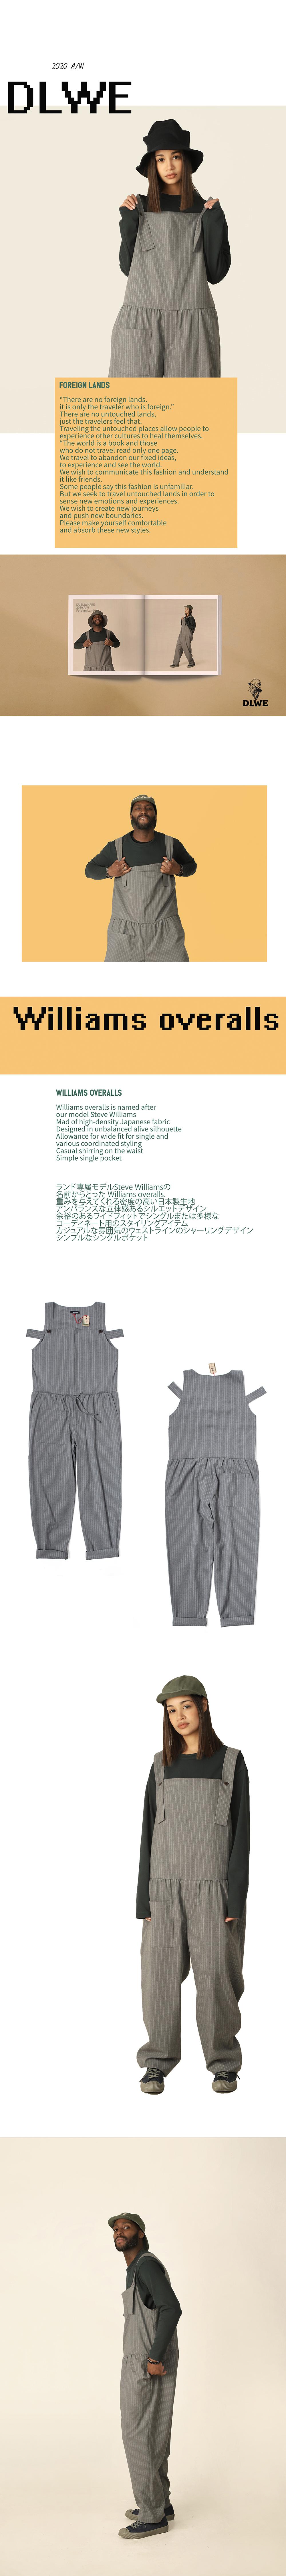 08_Williams+overall_Stripe+Grey_01.jpg